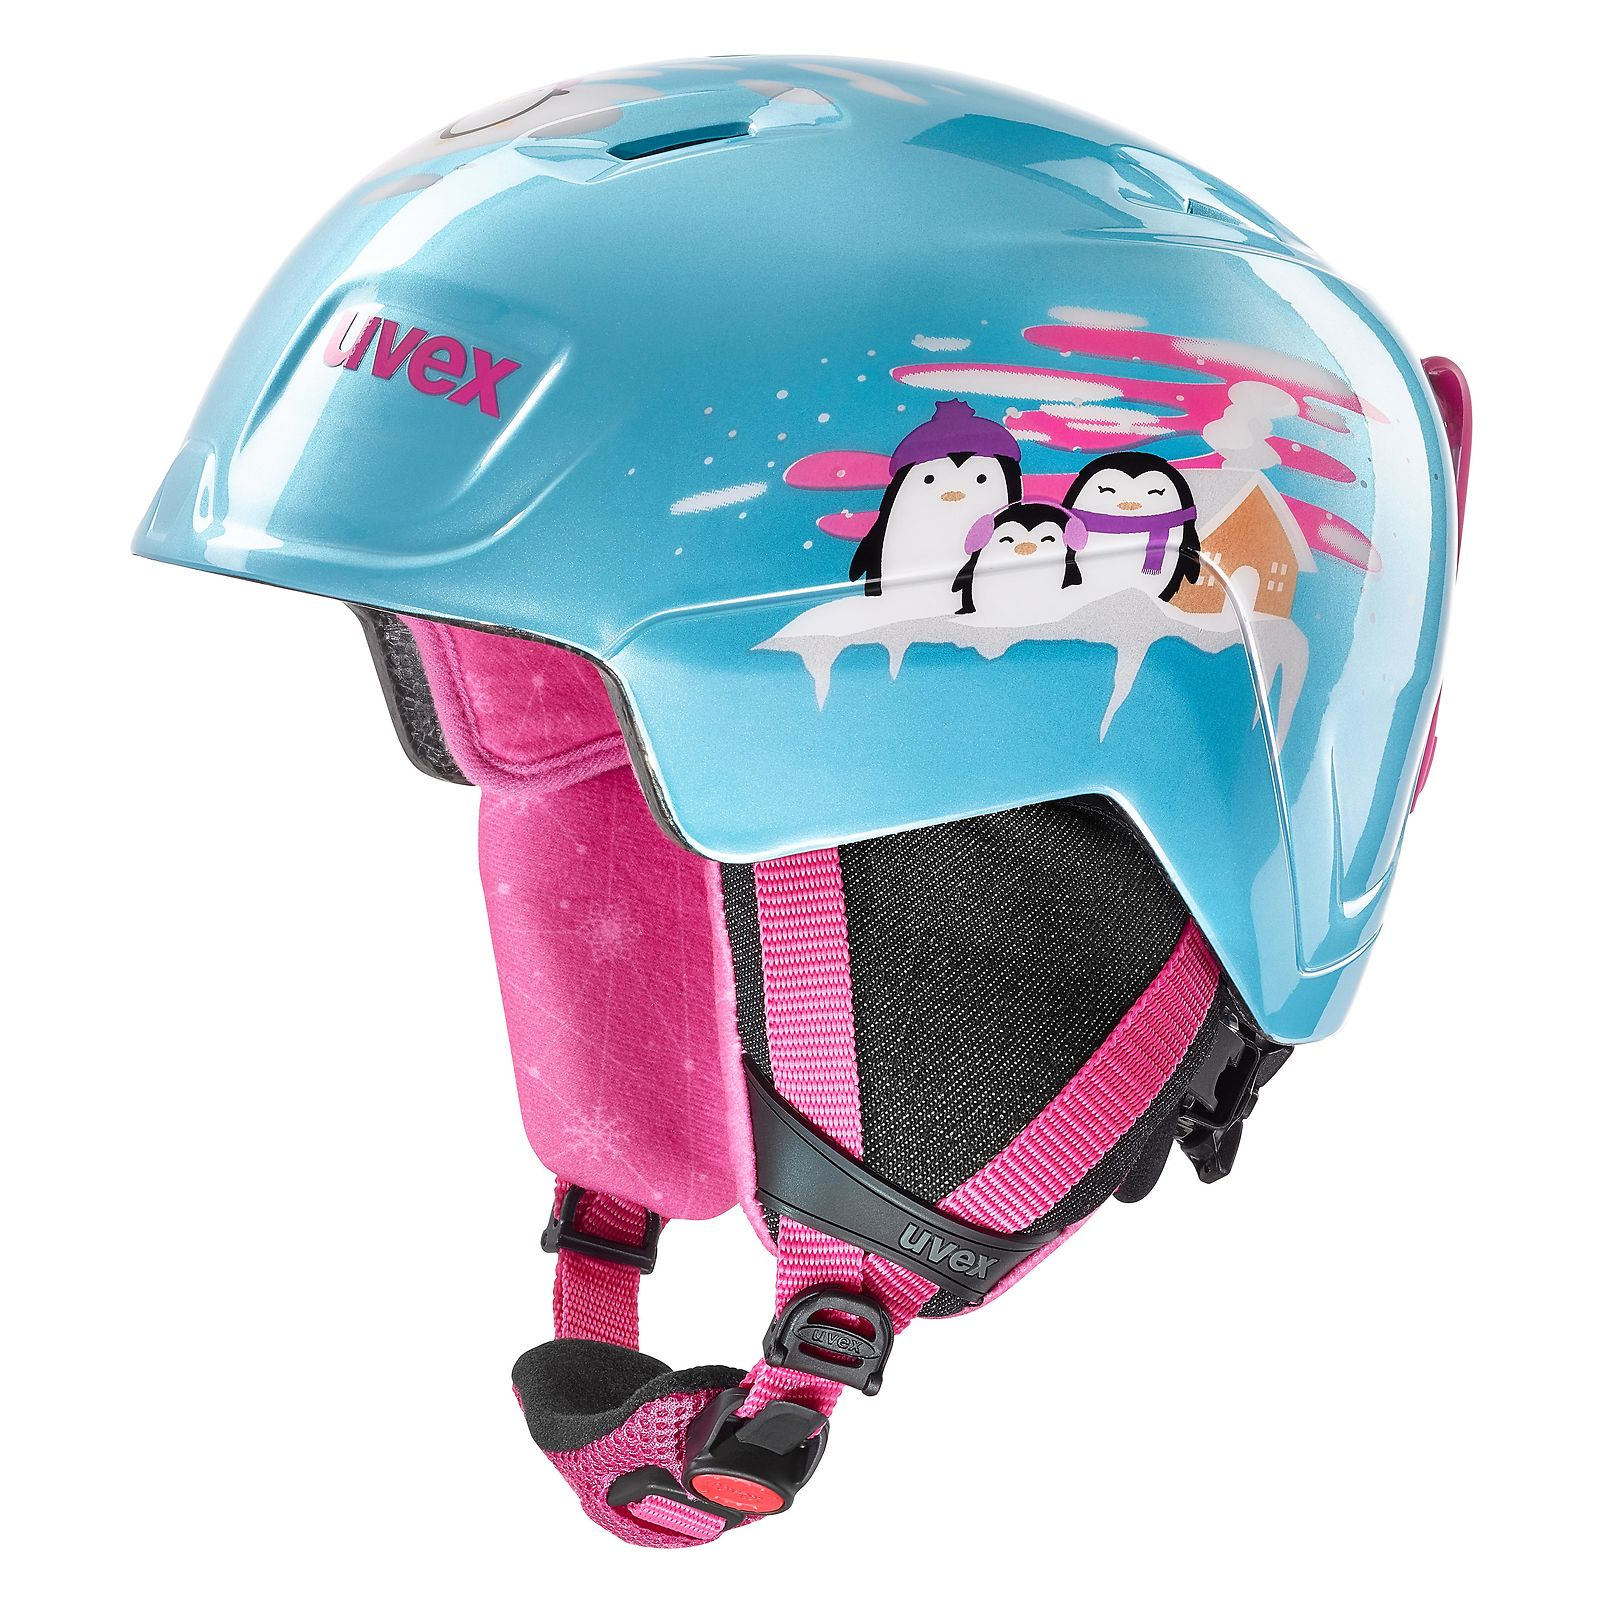 Kask narciarski Uvex Manic 566226